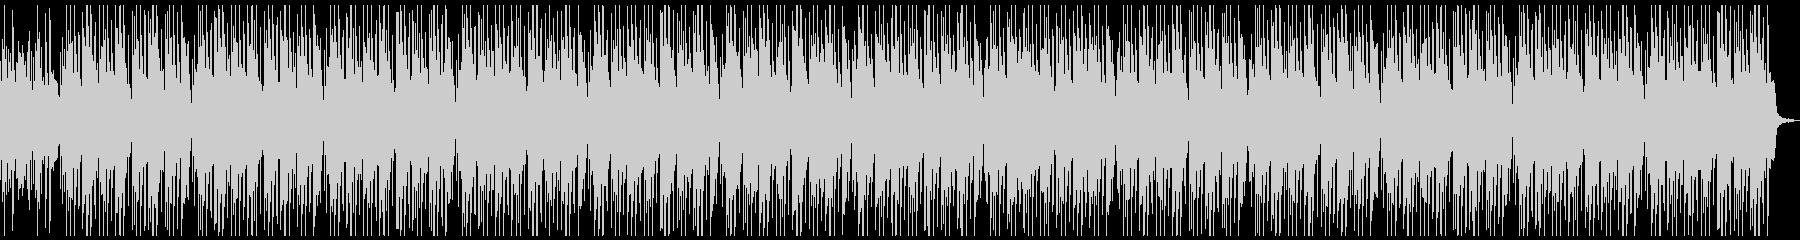 528Hz笛と民族楽器の瞑想BGMの未再生の波形